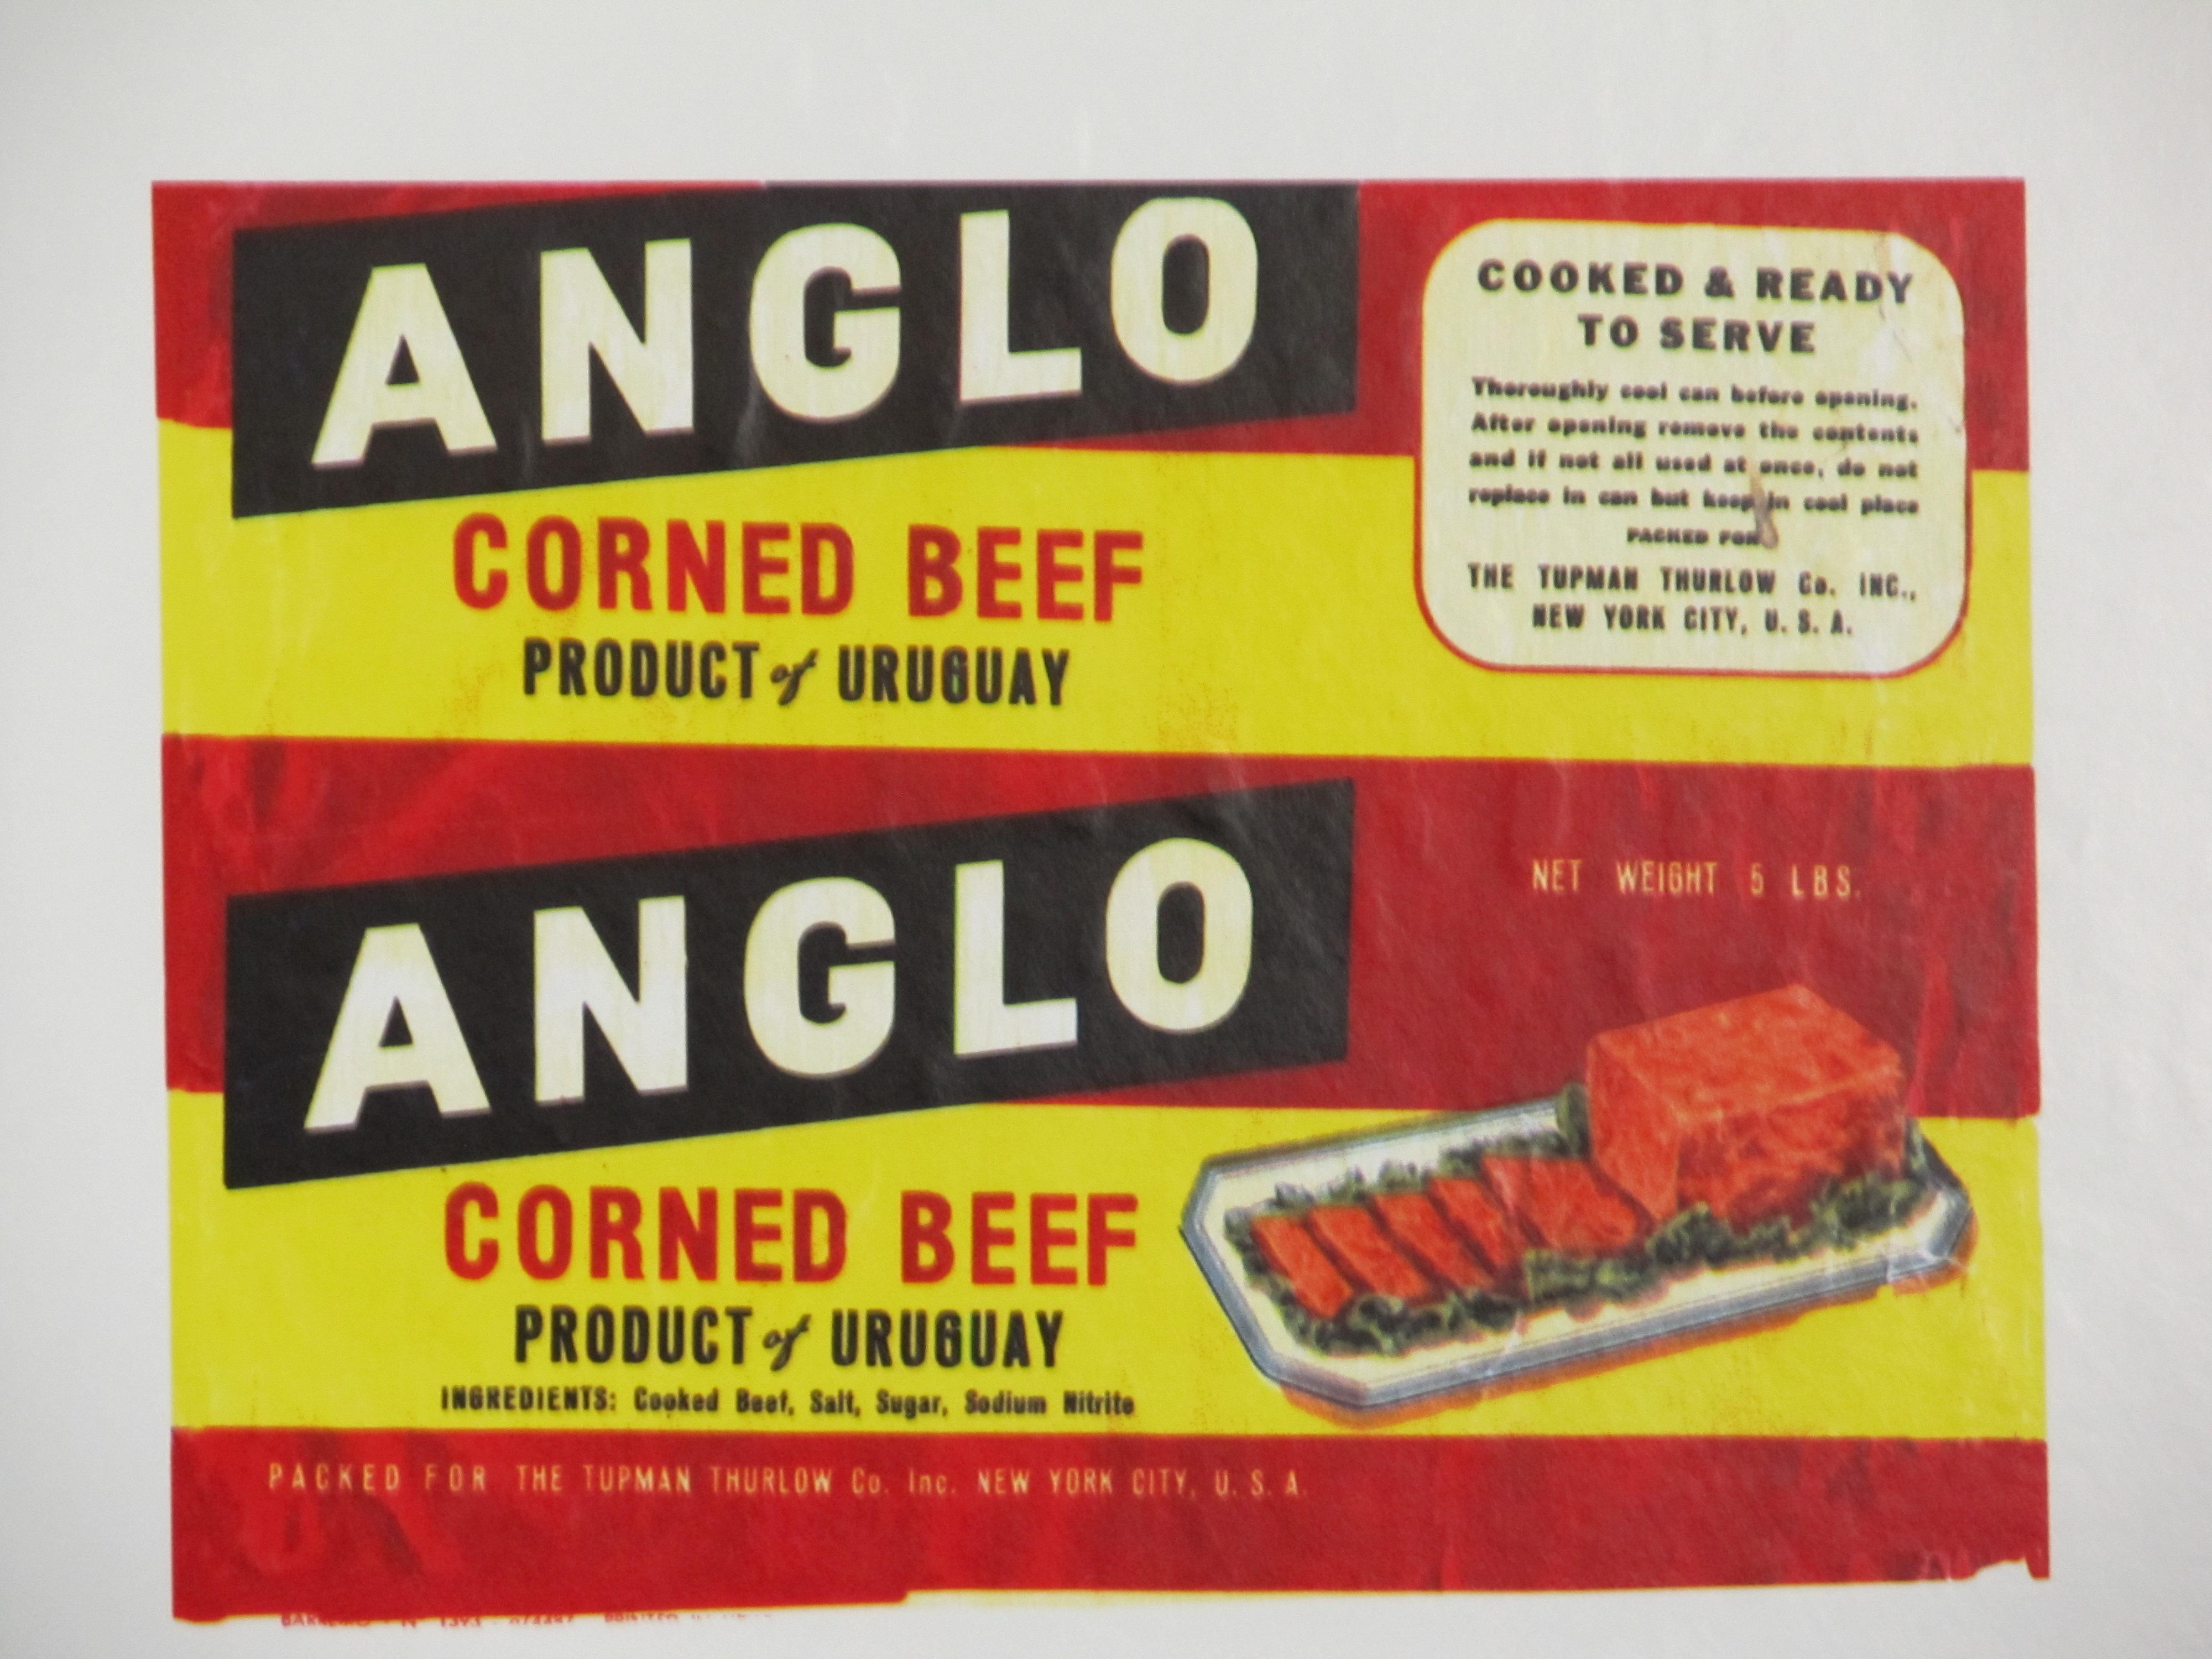 Fray Bentos Corned Beef Food Poisoning